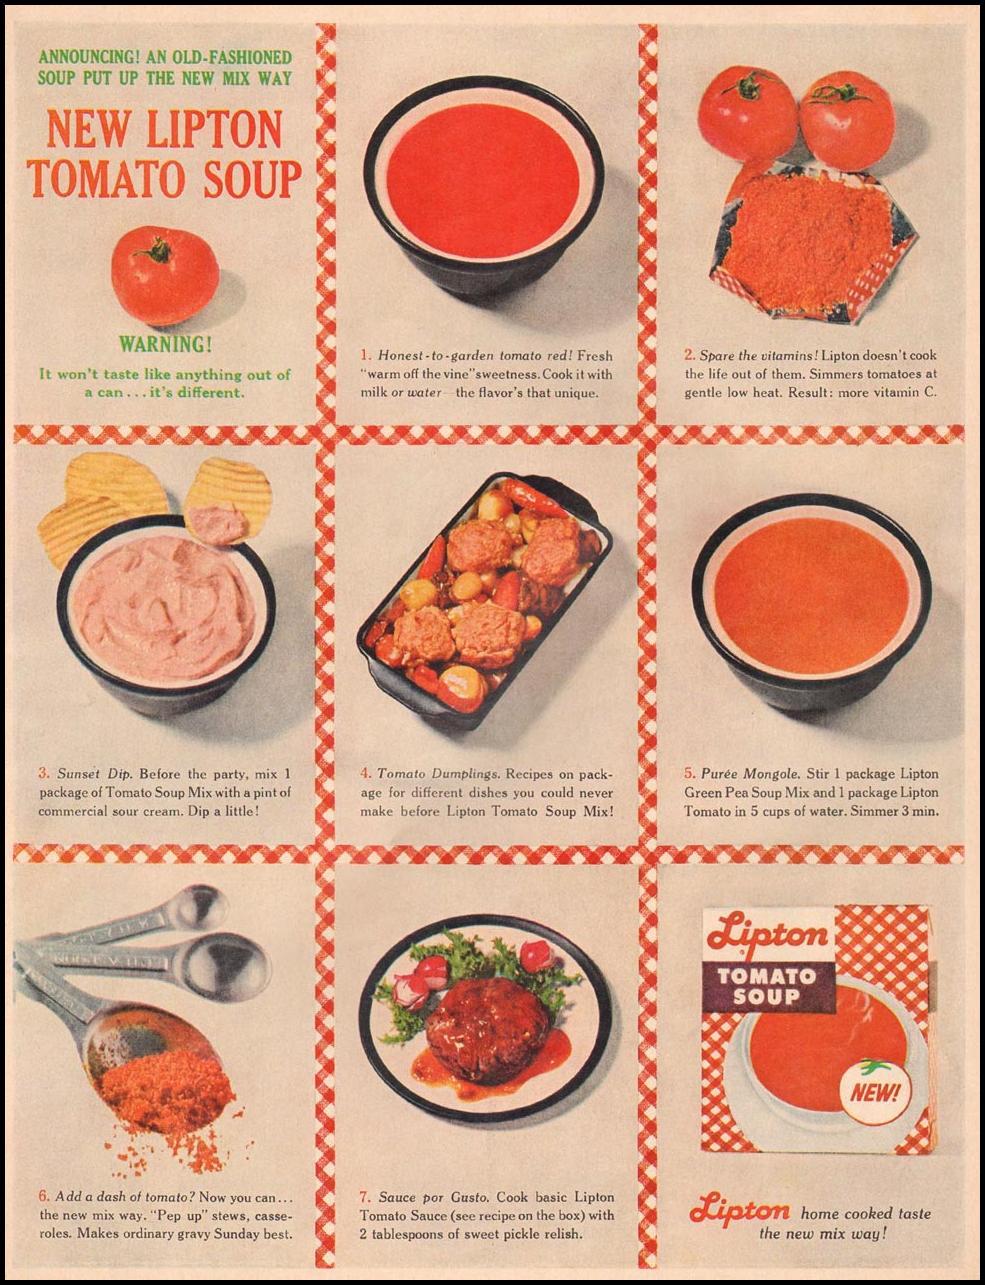 LIPTON TOMATO SOUP LIFE 03/31/1961